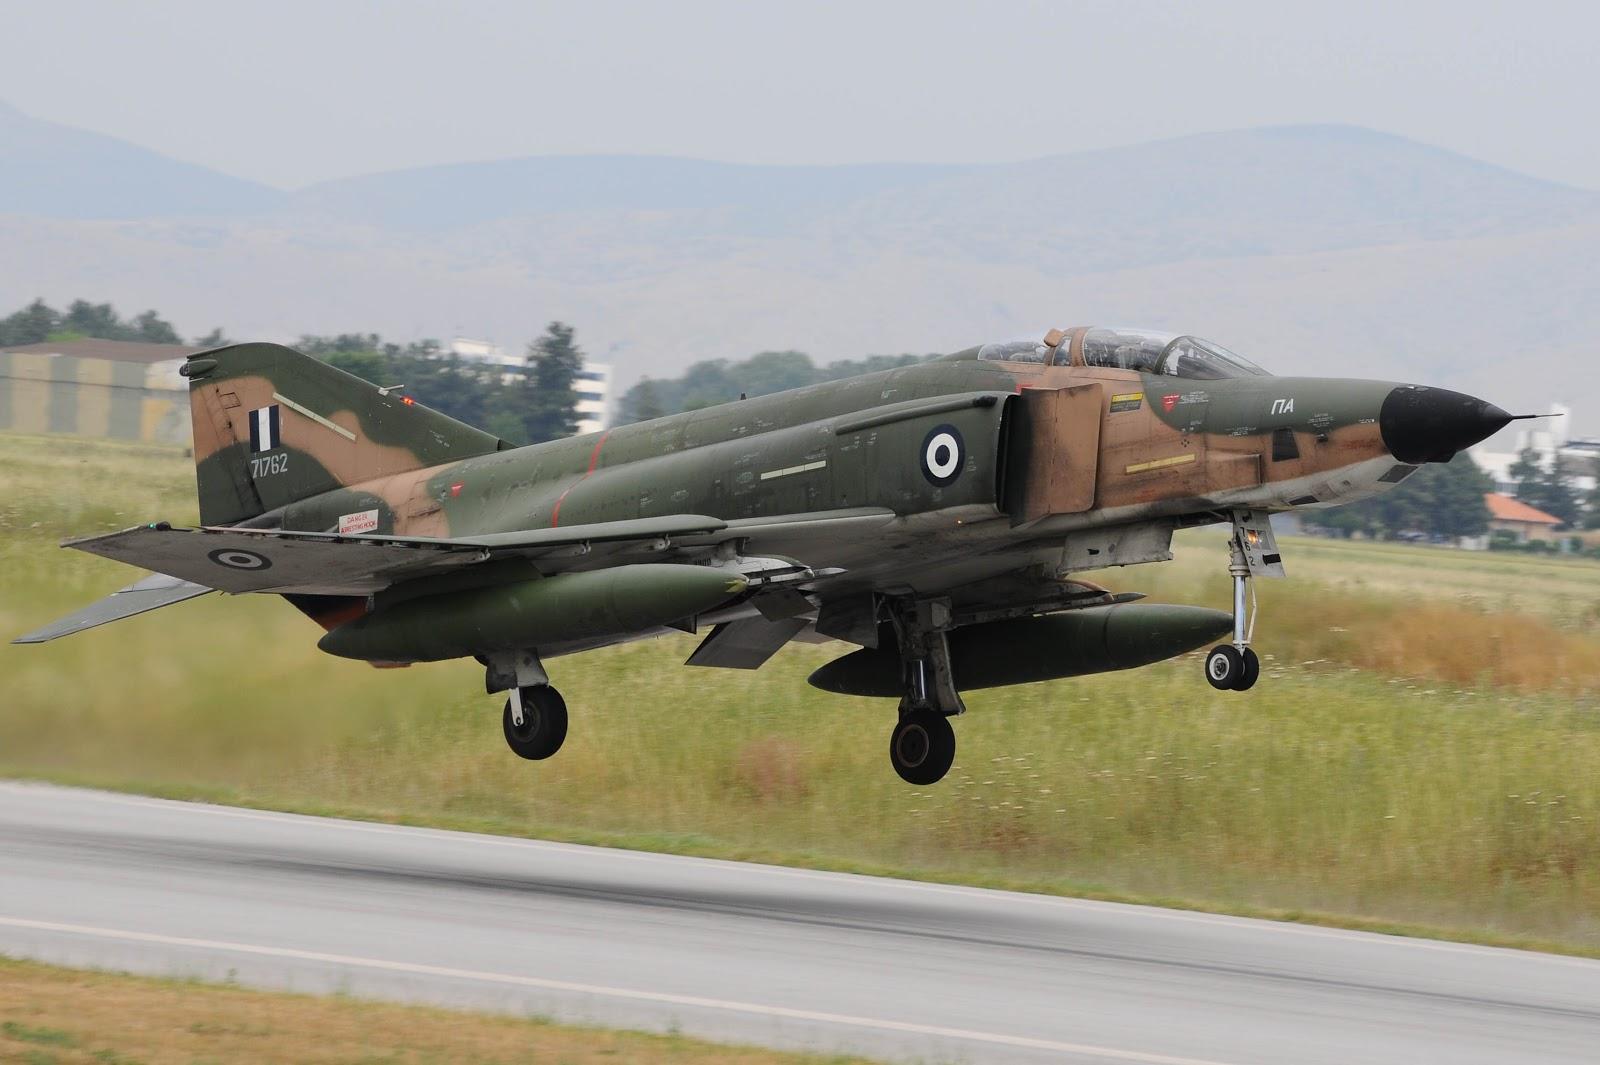 McDonnell Douglas RF-4E Greek Phantom II taking off